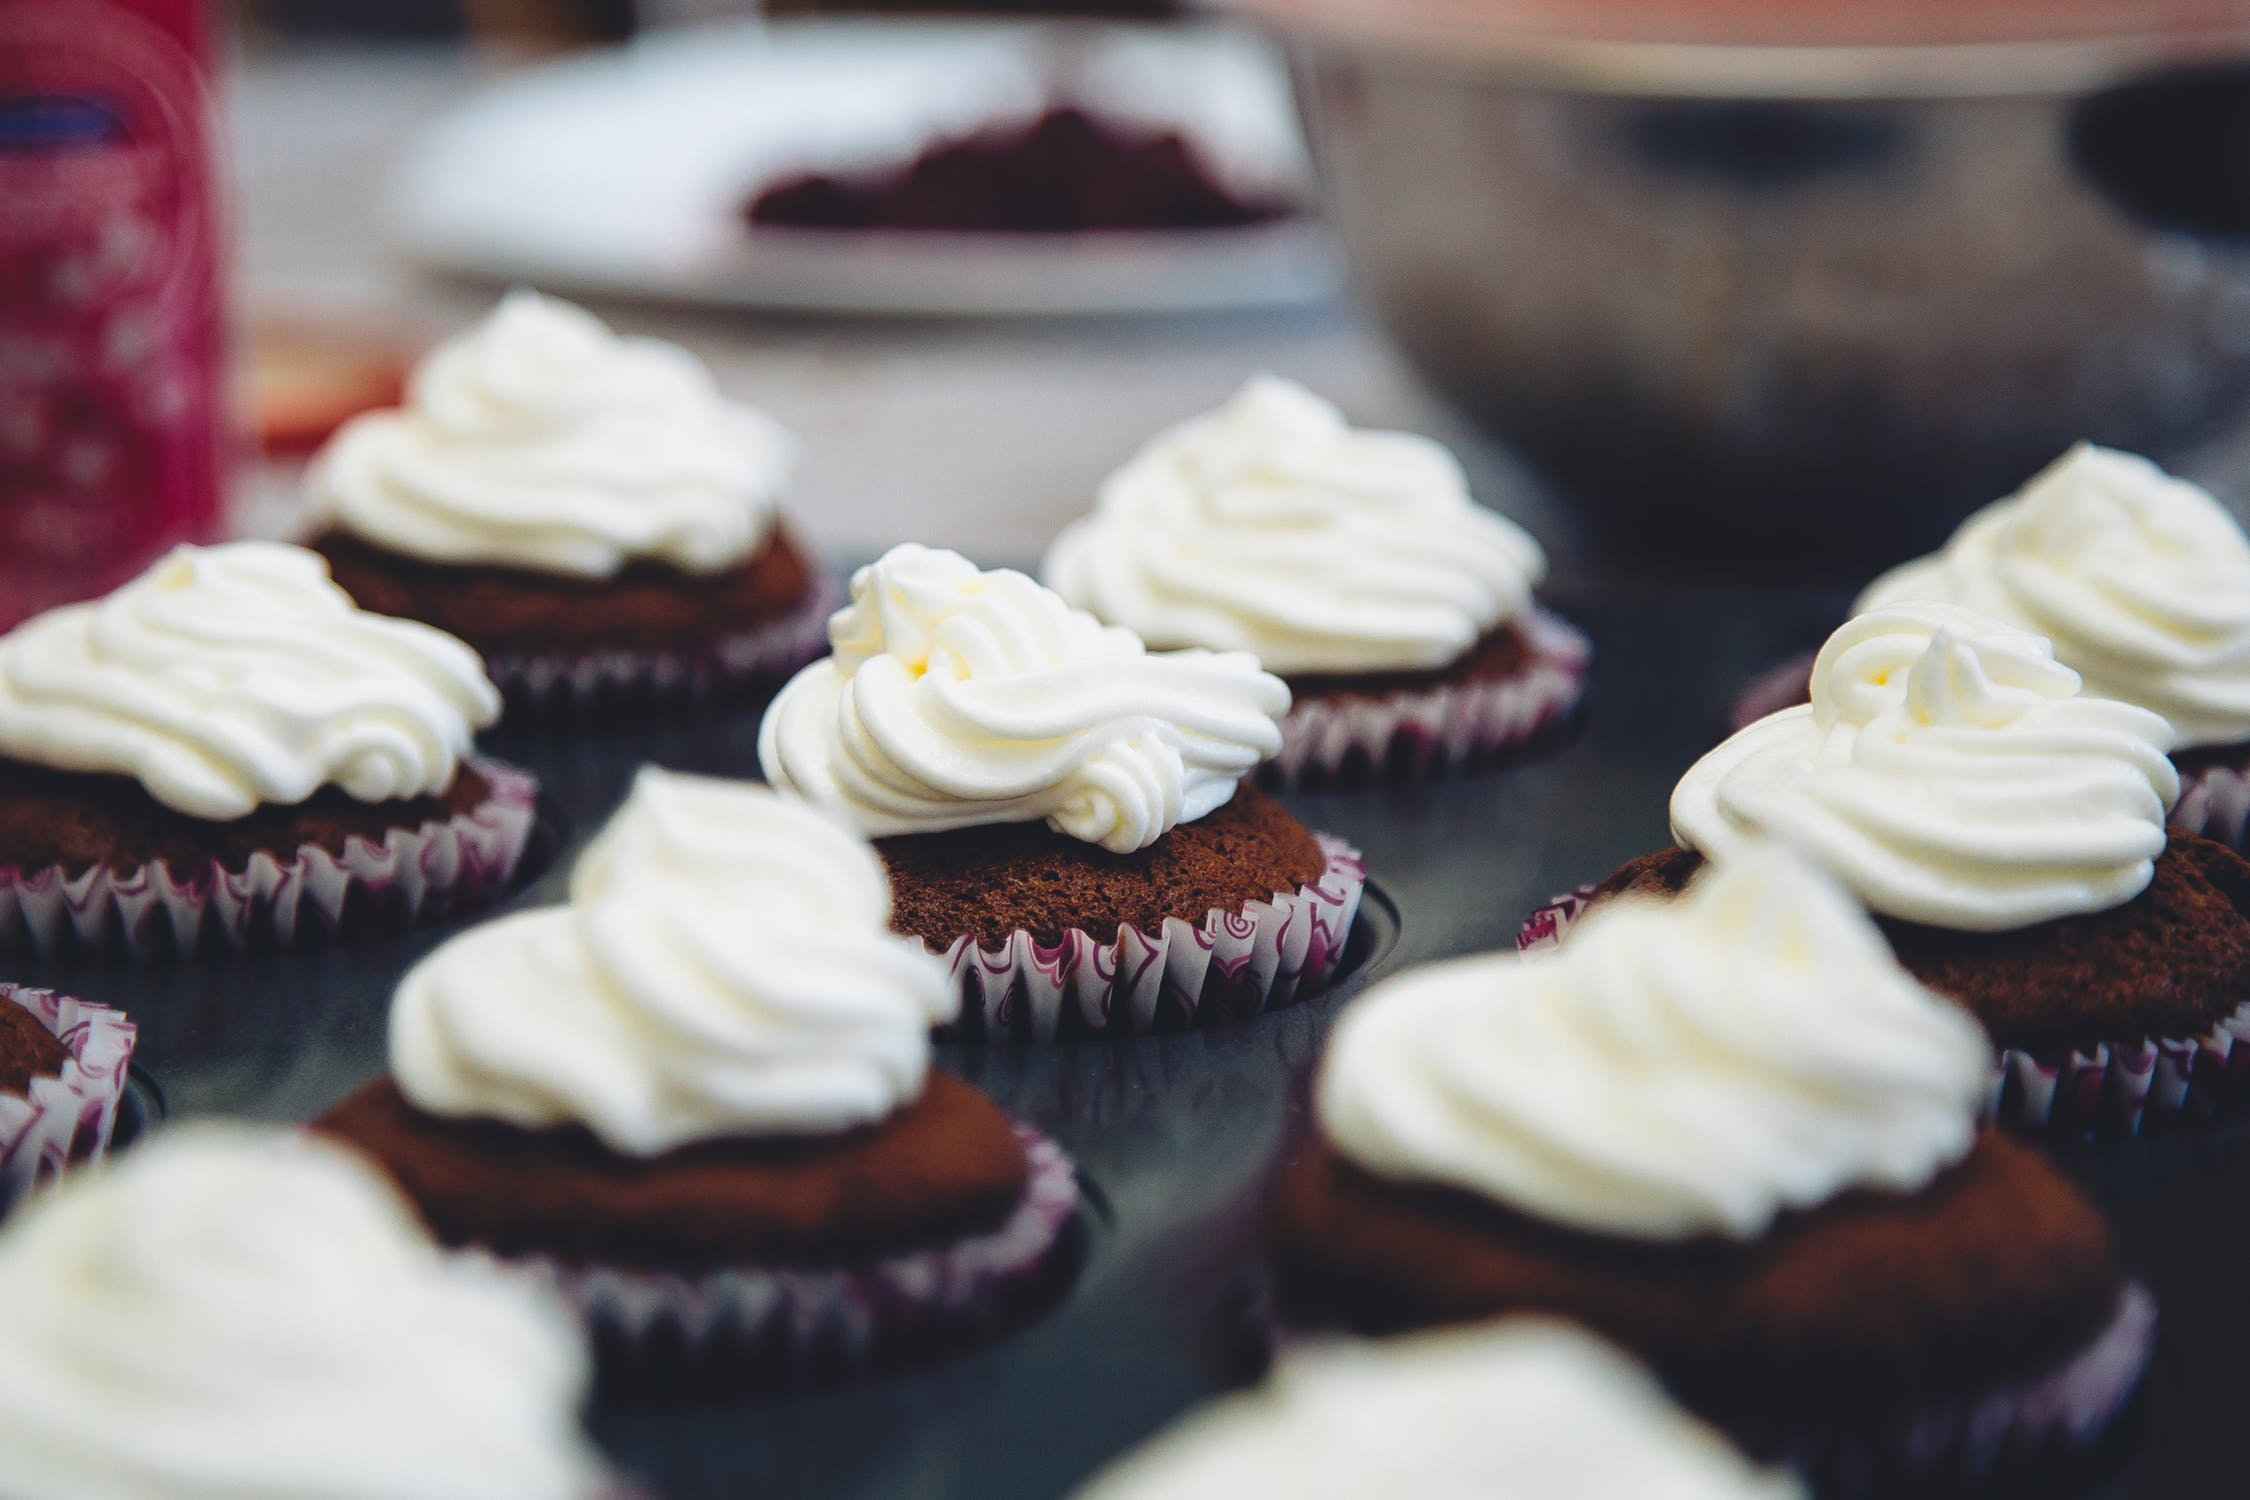 kitchen-cookies-work-cake-8148